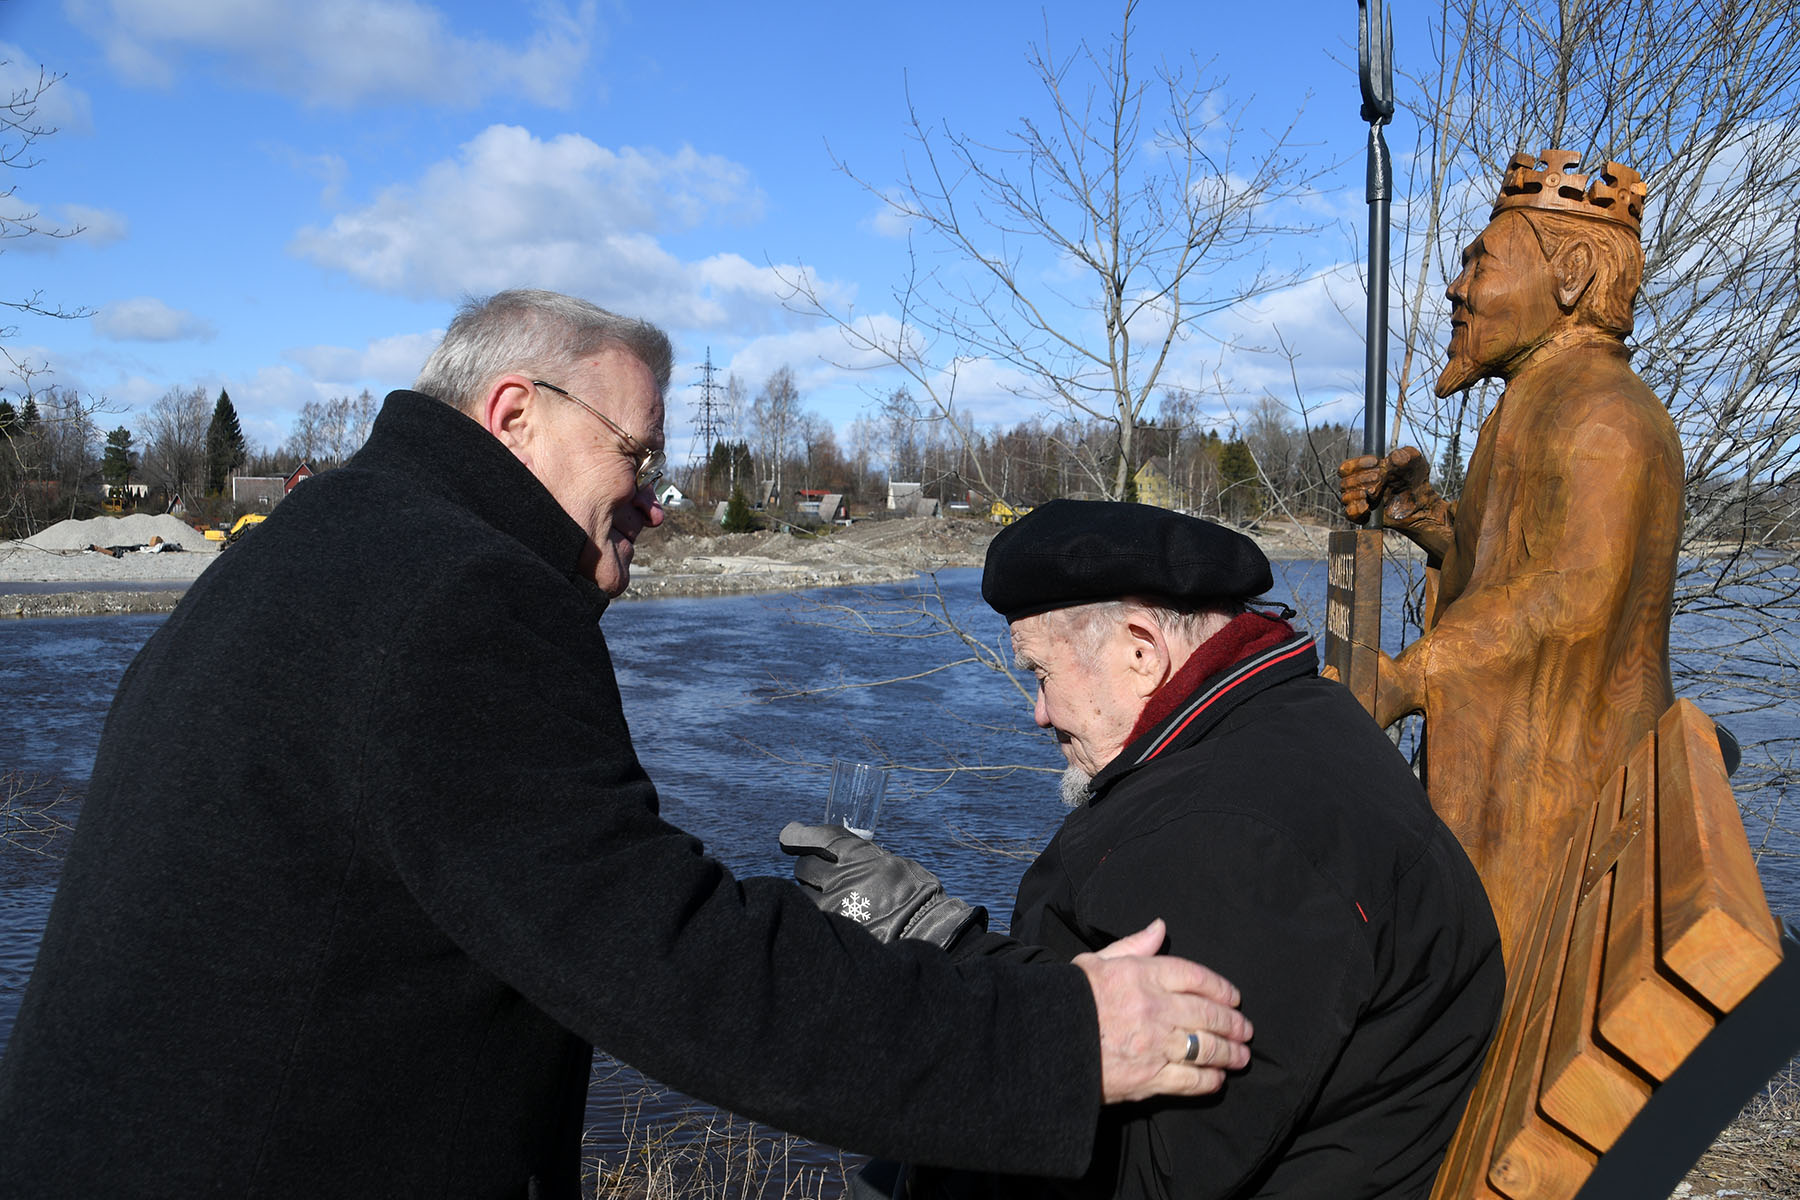 Peapiiskop emeeritus Andres Põder, Hans Soll ja Neptun. Foto Urmas Saard